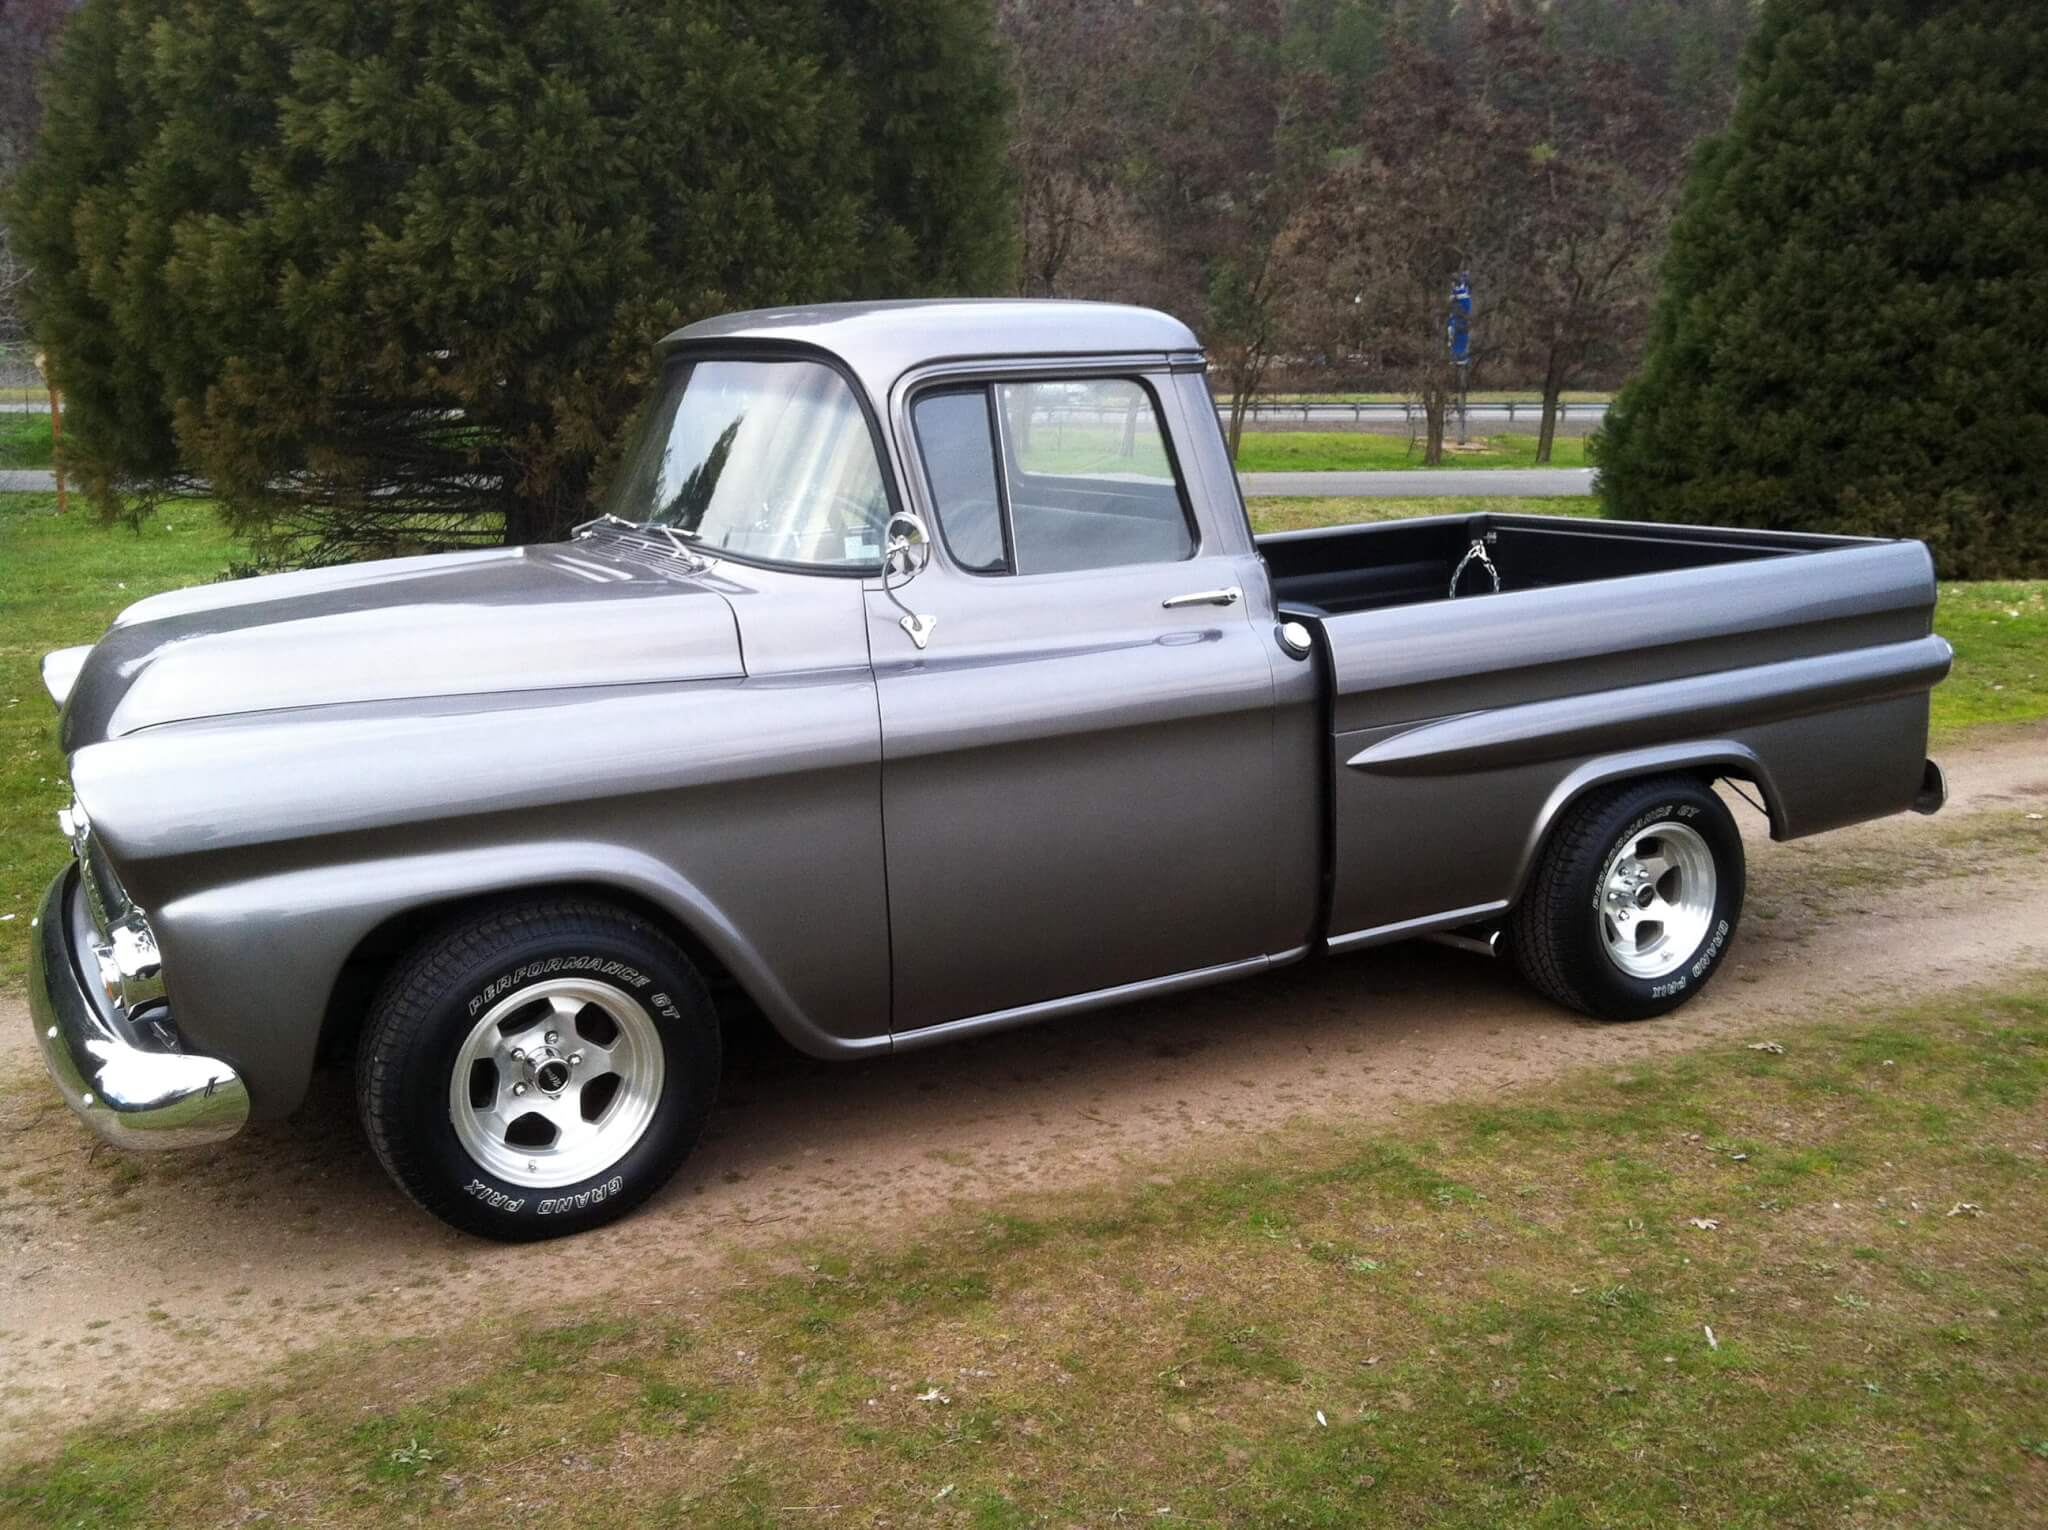 1959 Chevy Apache - Tony Wieser - LMC Truck Life